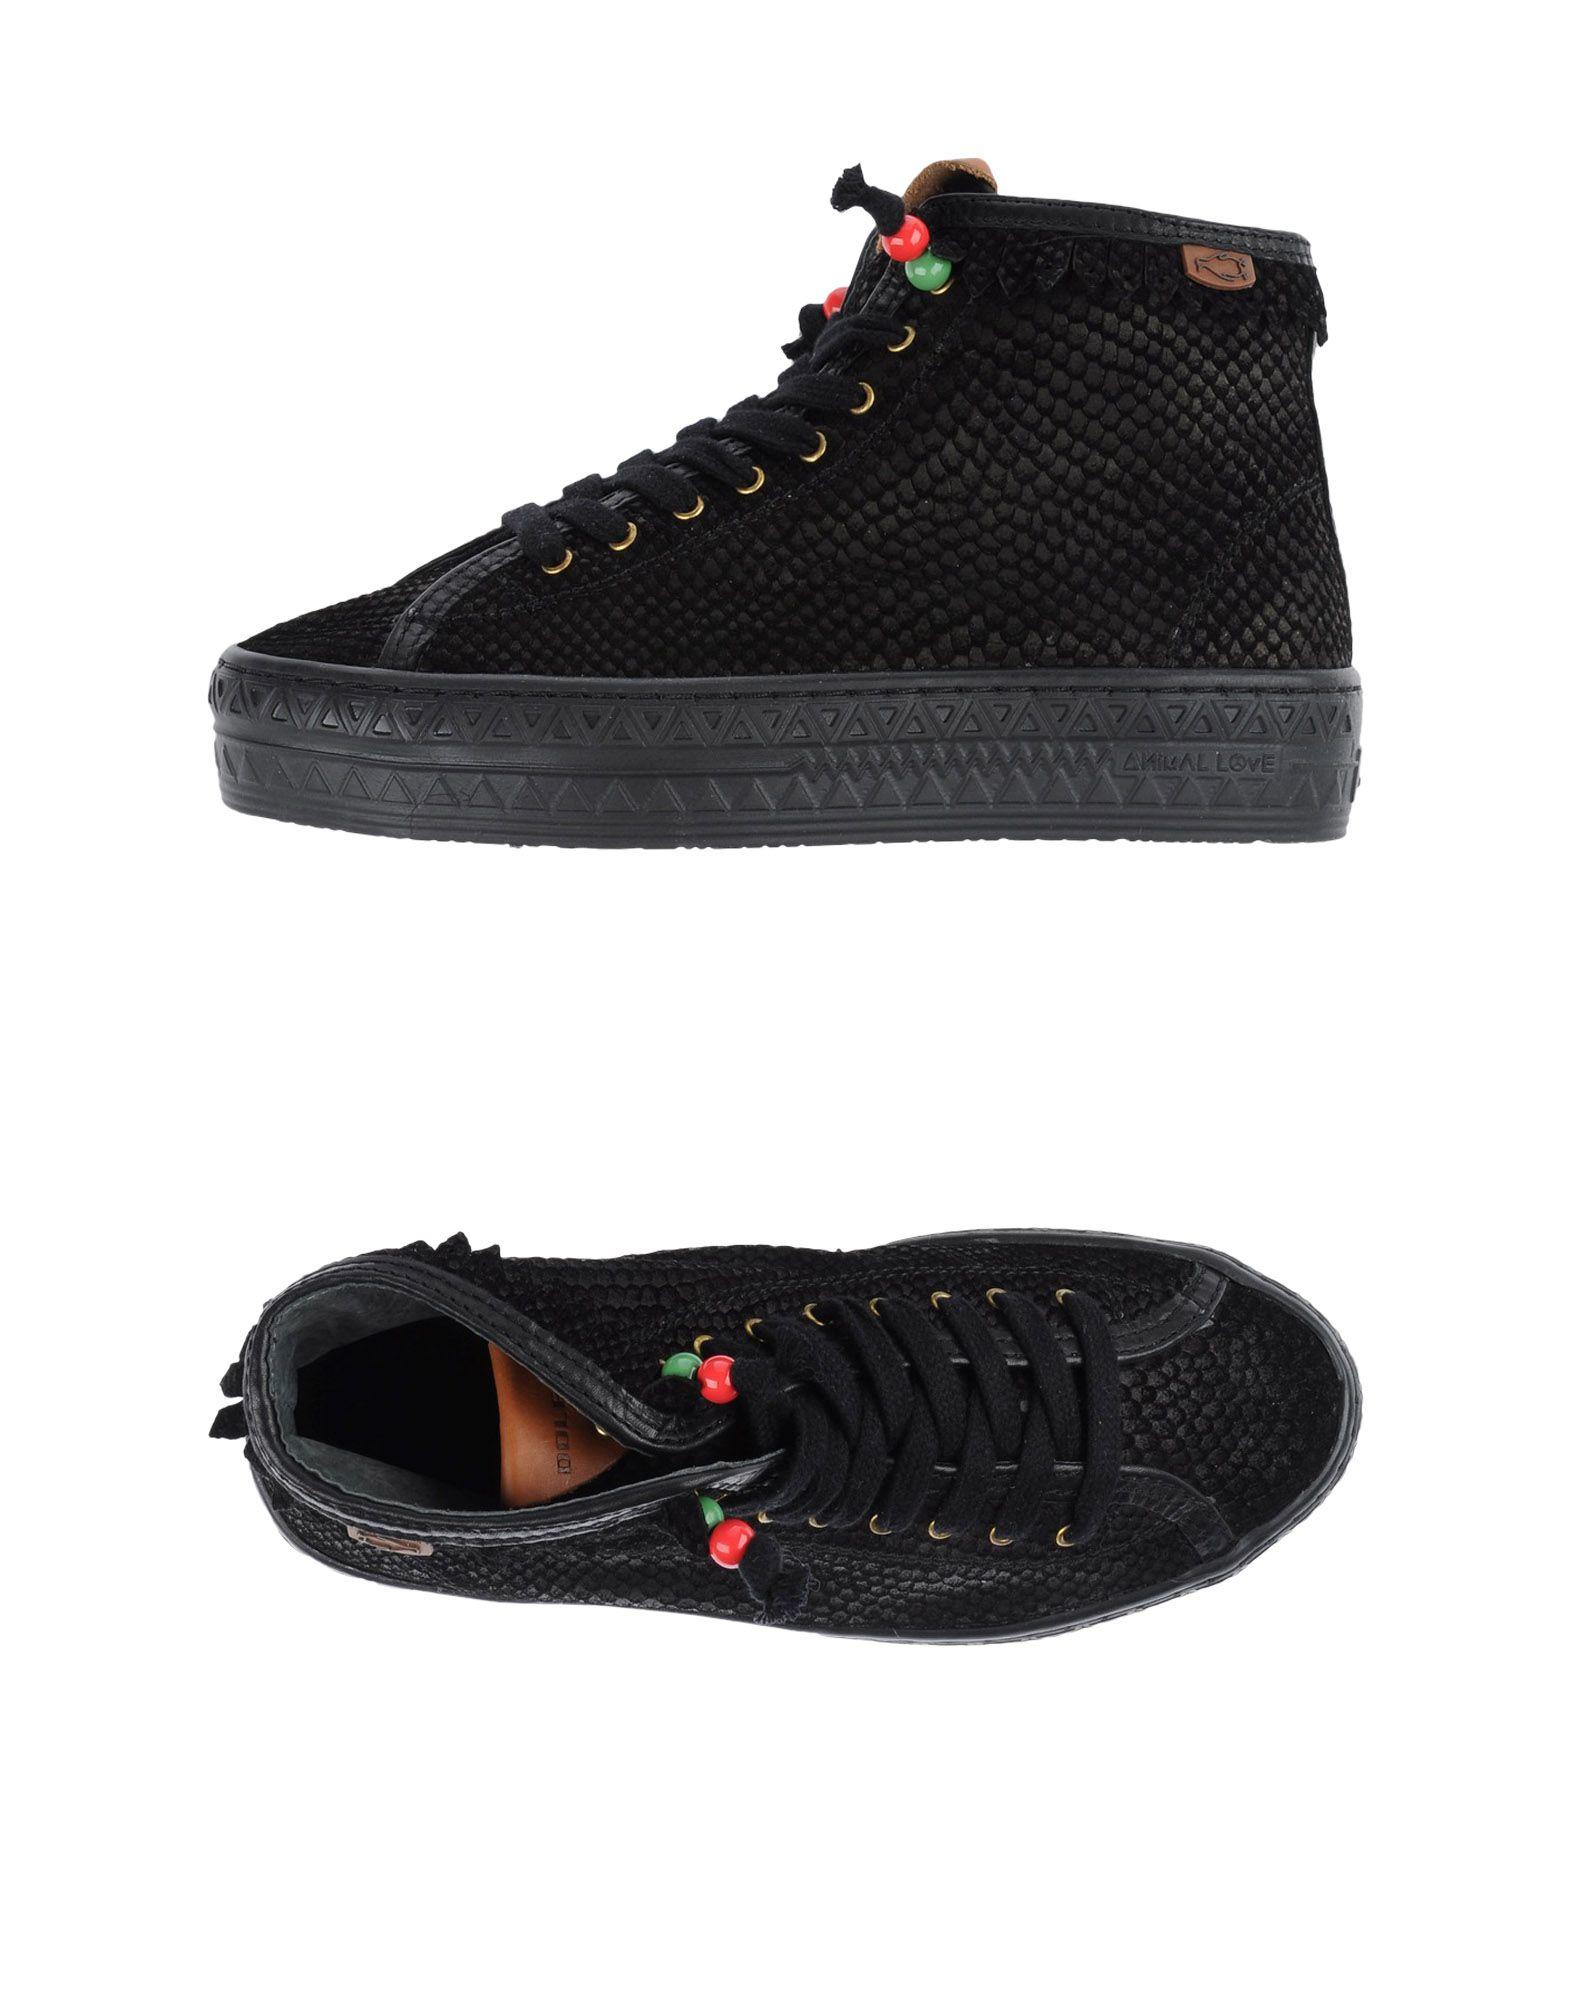 Dolfie Shoes Uk